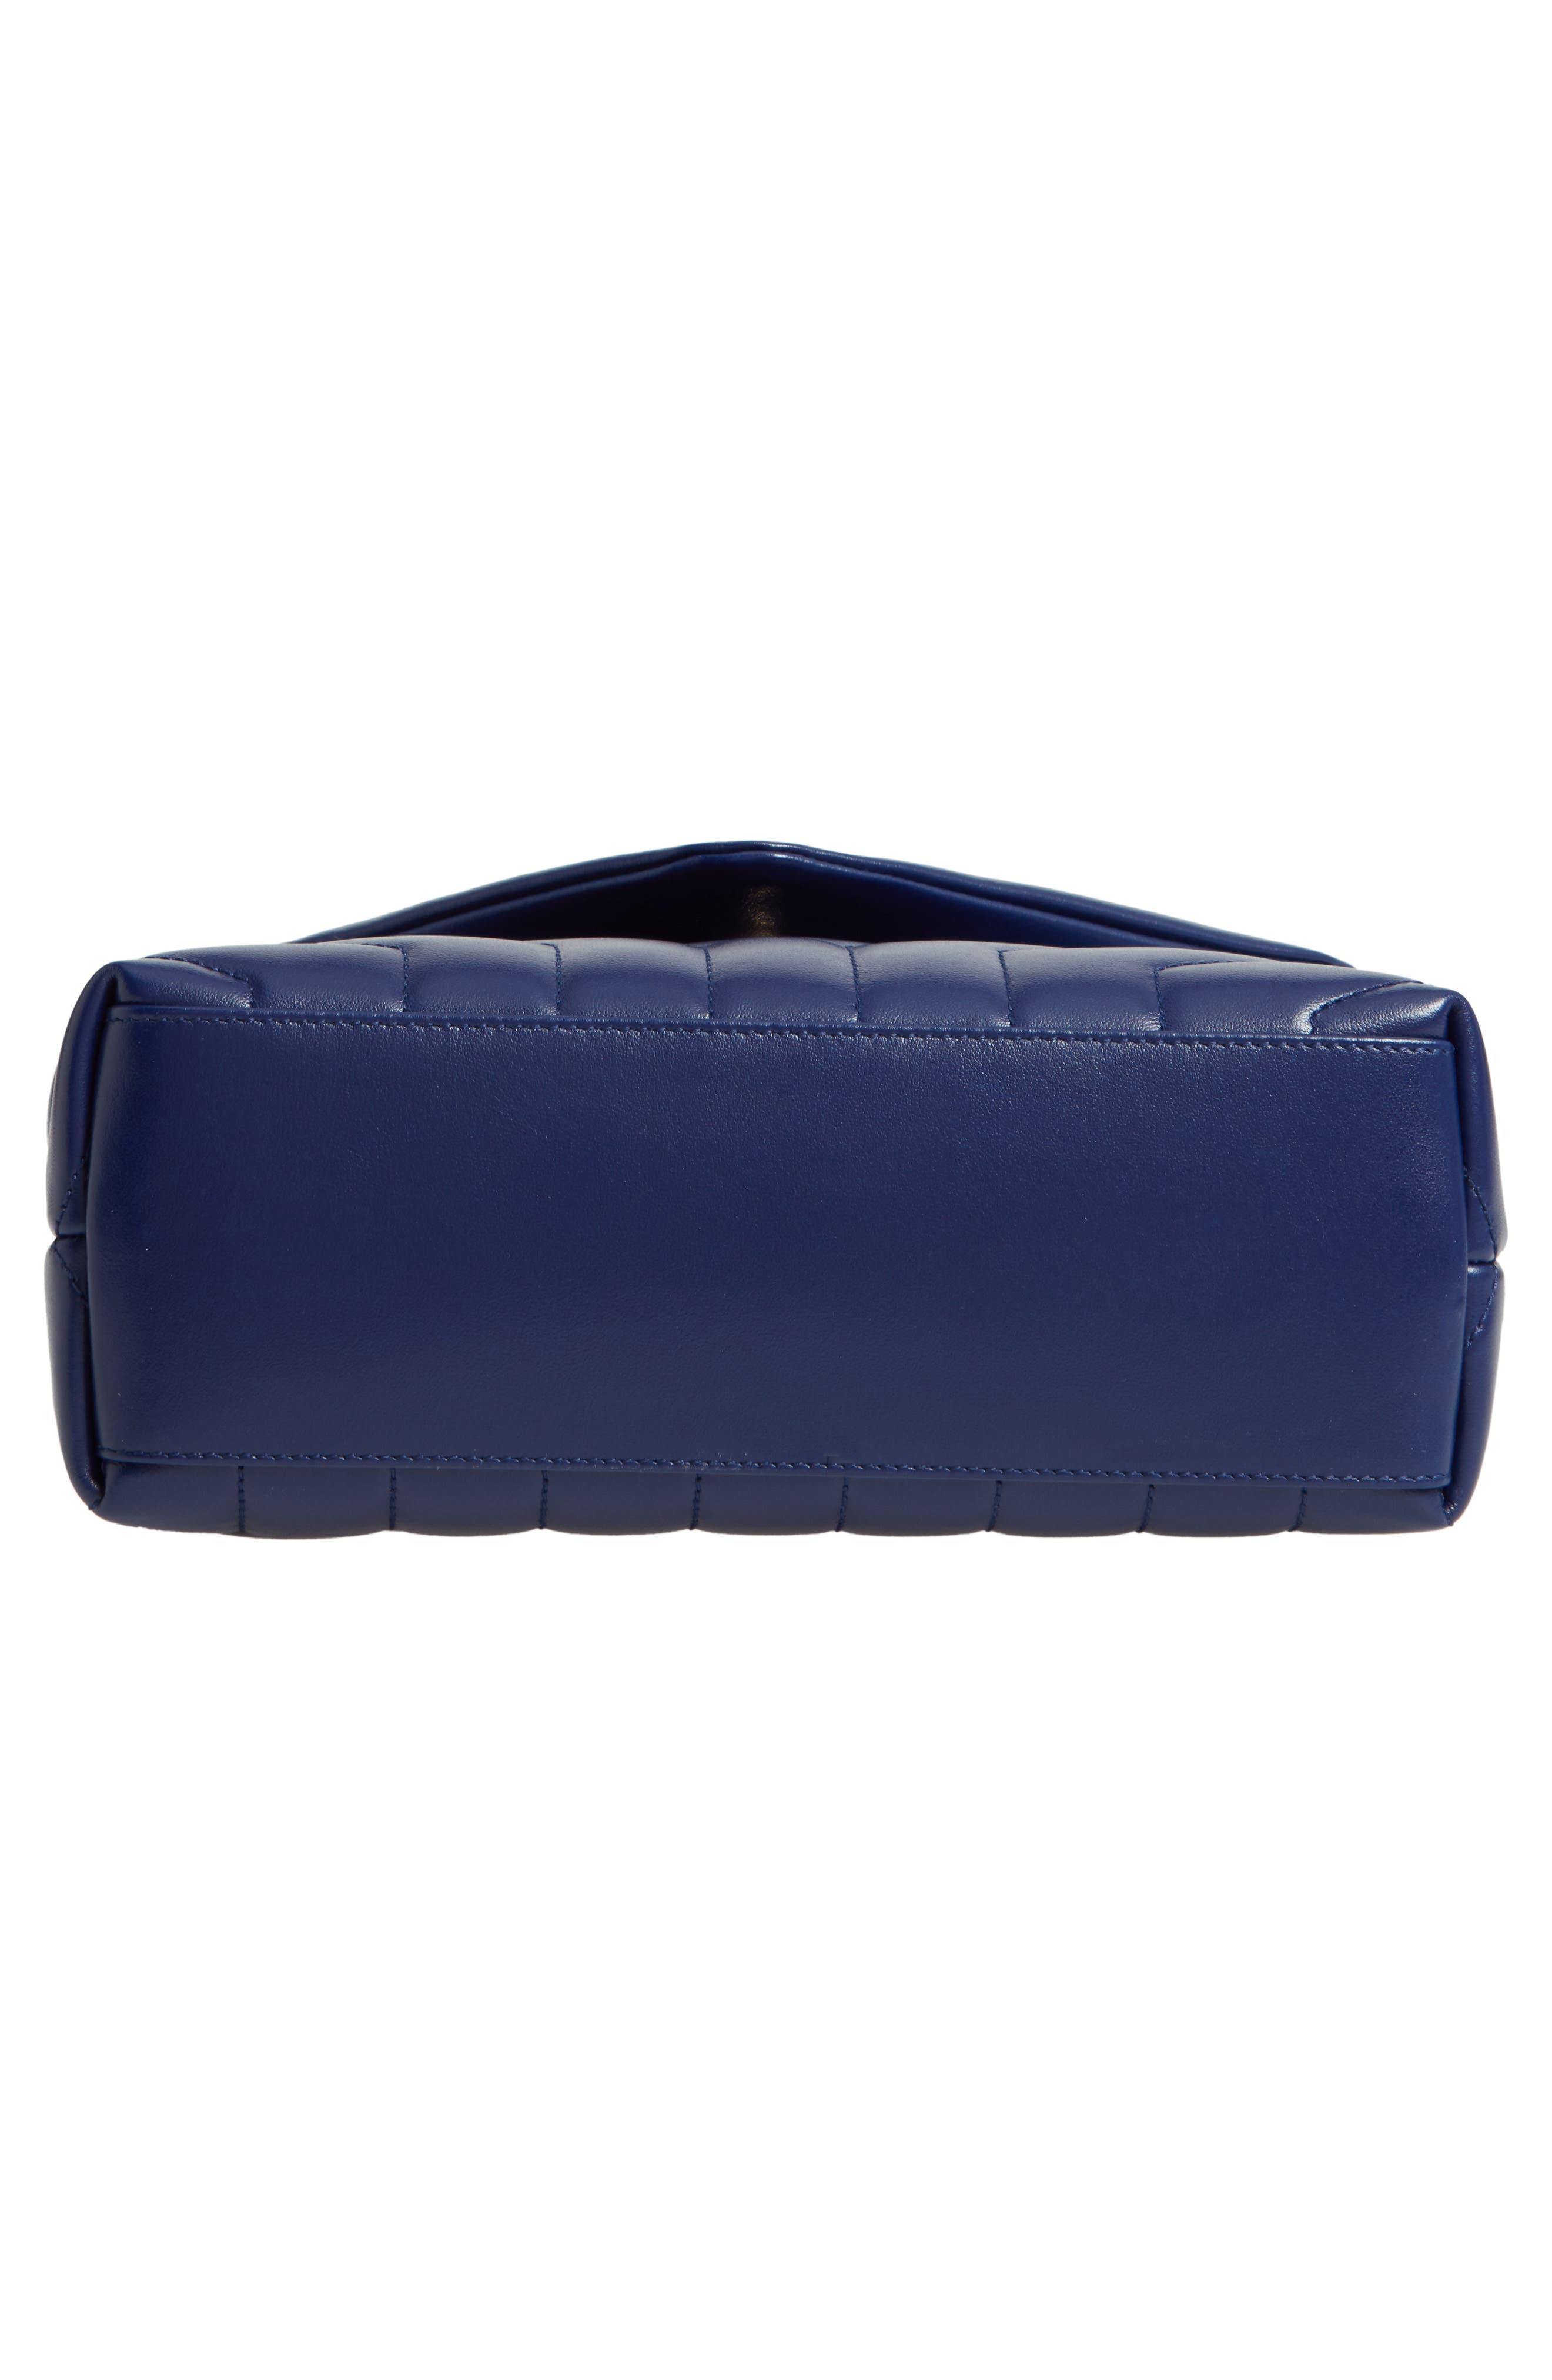 Small Loulou Leather Shoulder Bag,                             Alternate thumbnail 6, color,                             SAPHIR